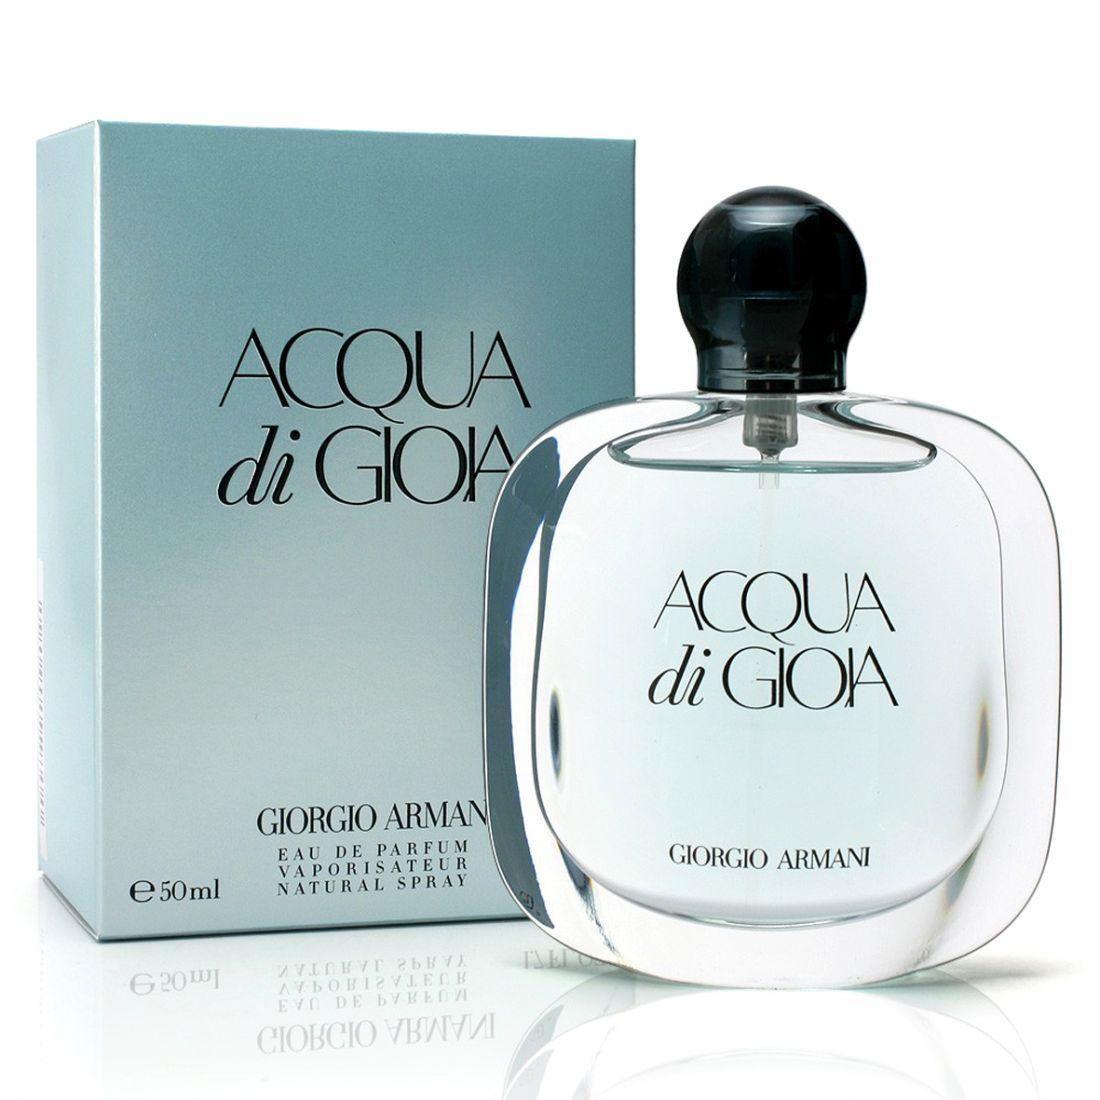 Giorgio Armani - Aqua Di Gioia, 50 ml